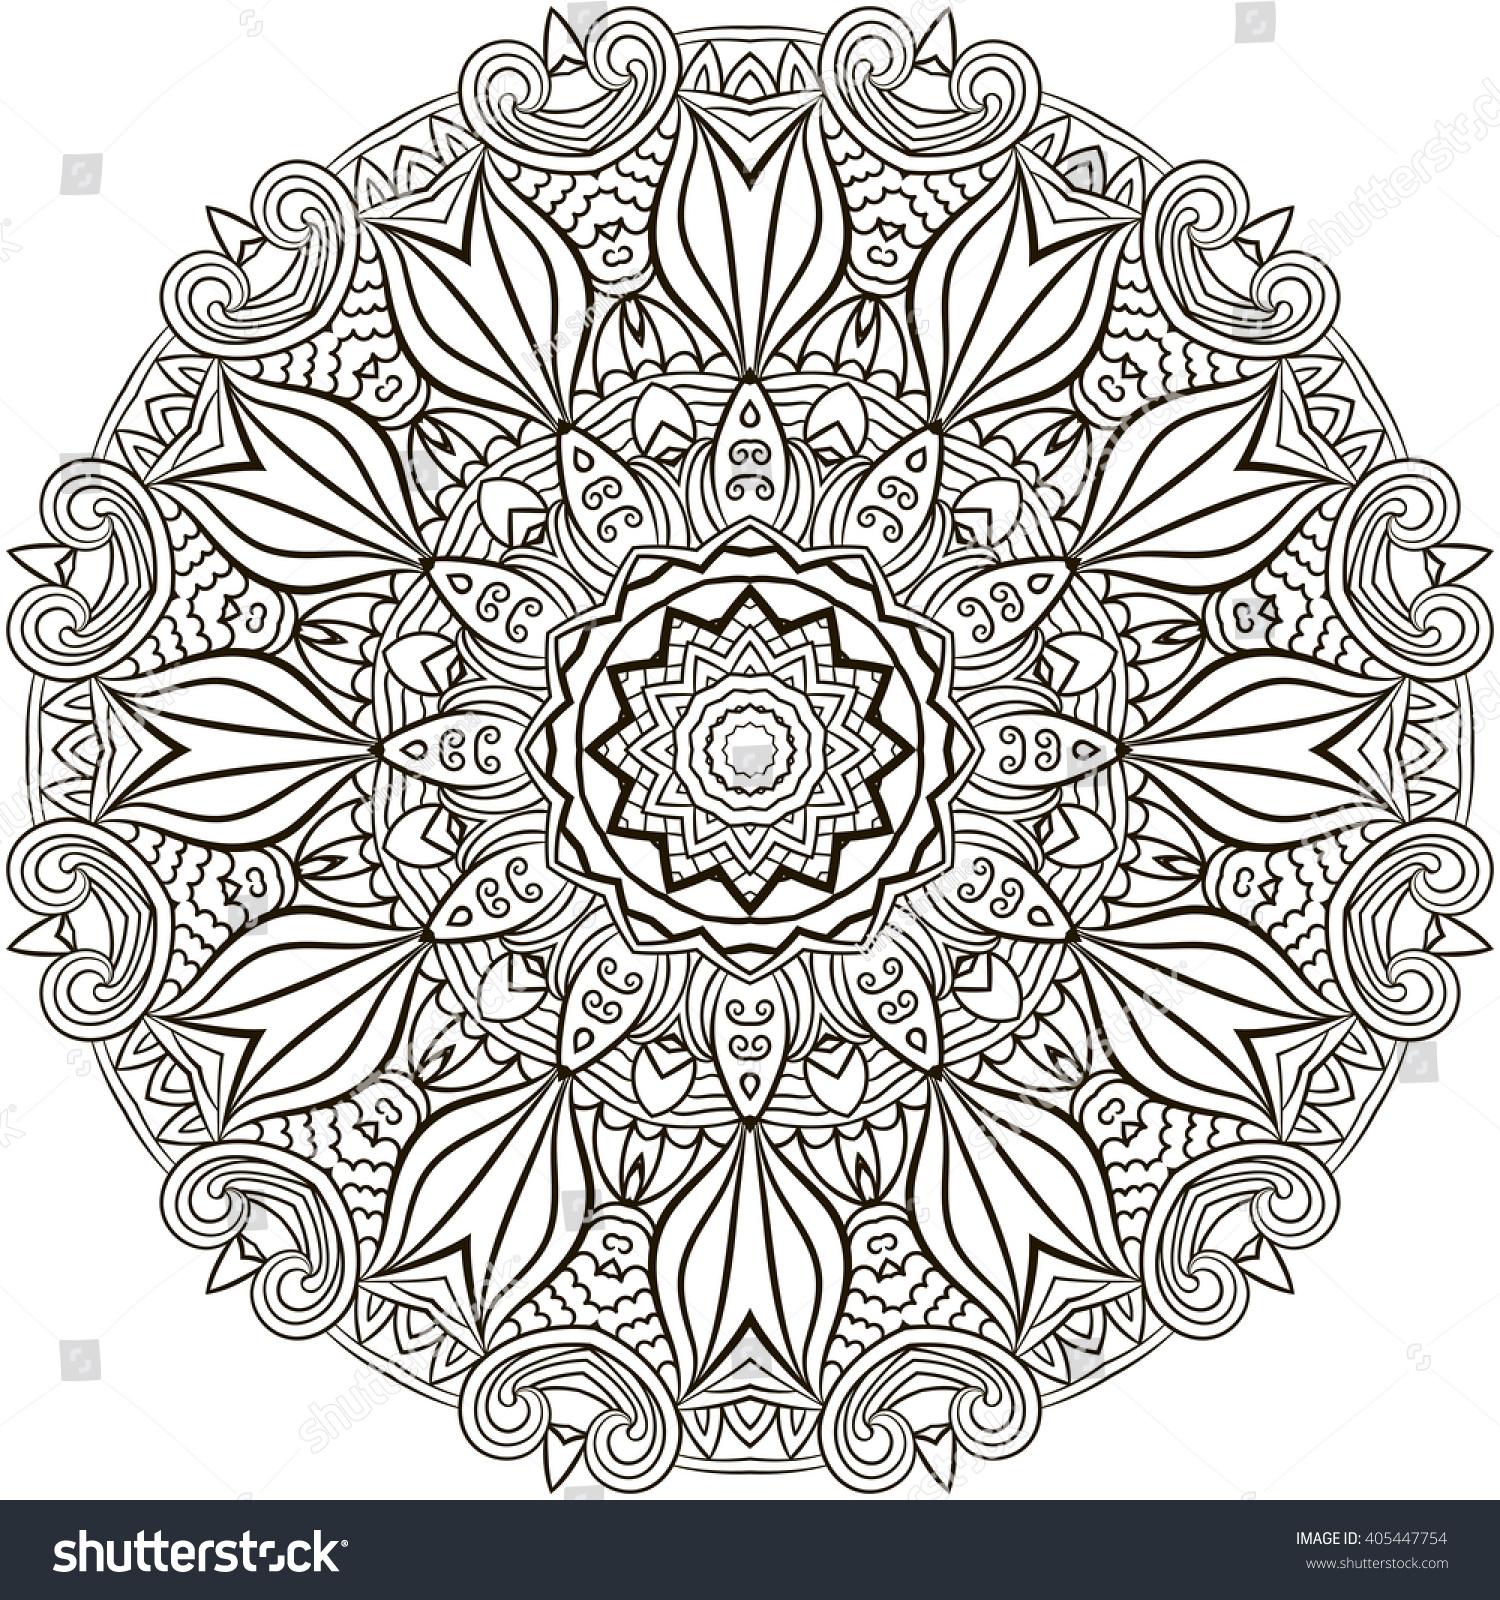 mandala coloring illustration coloring book stock vector